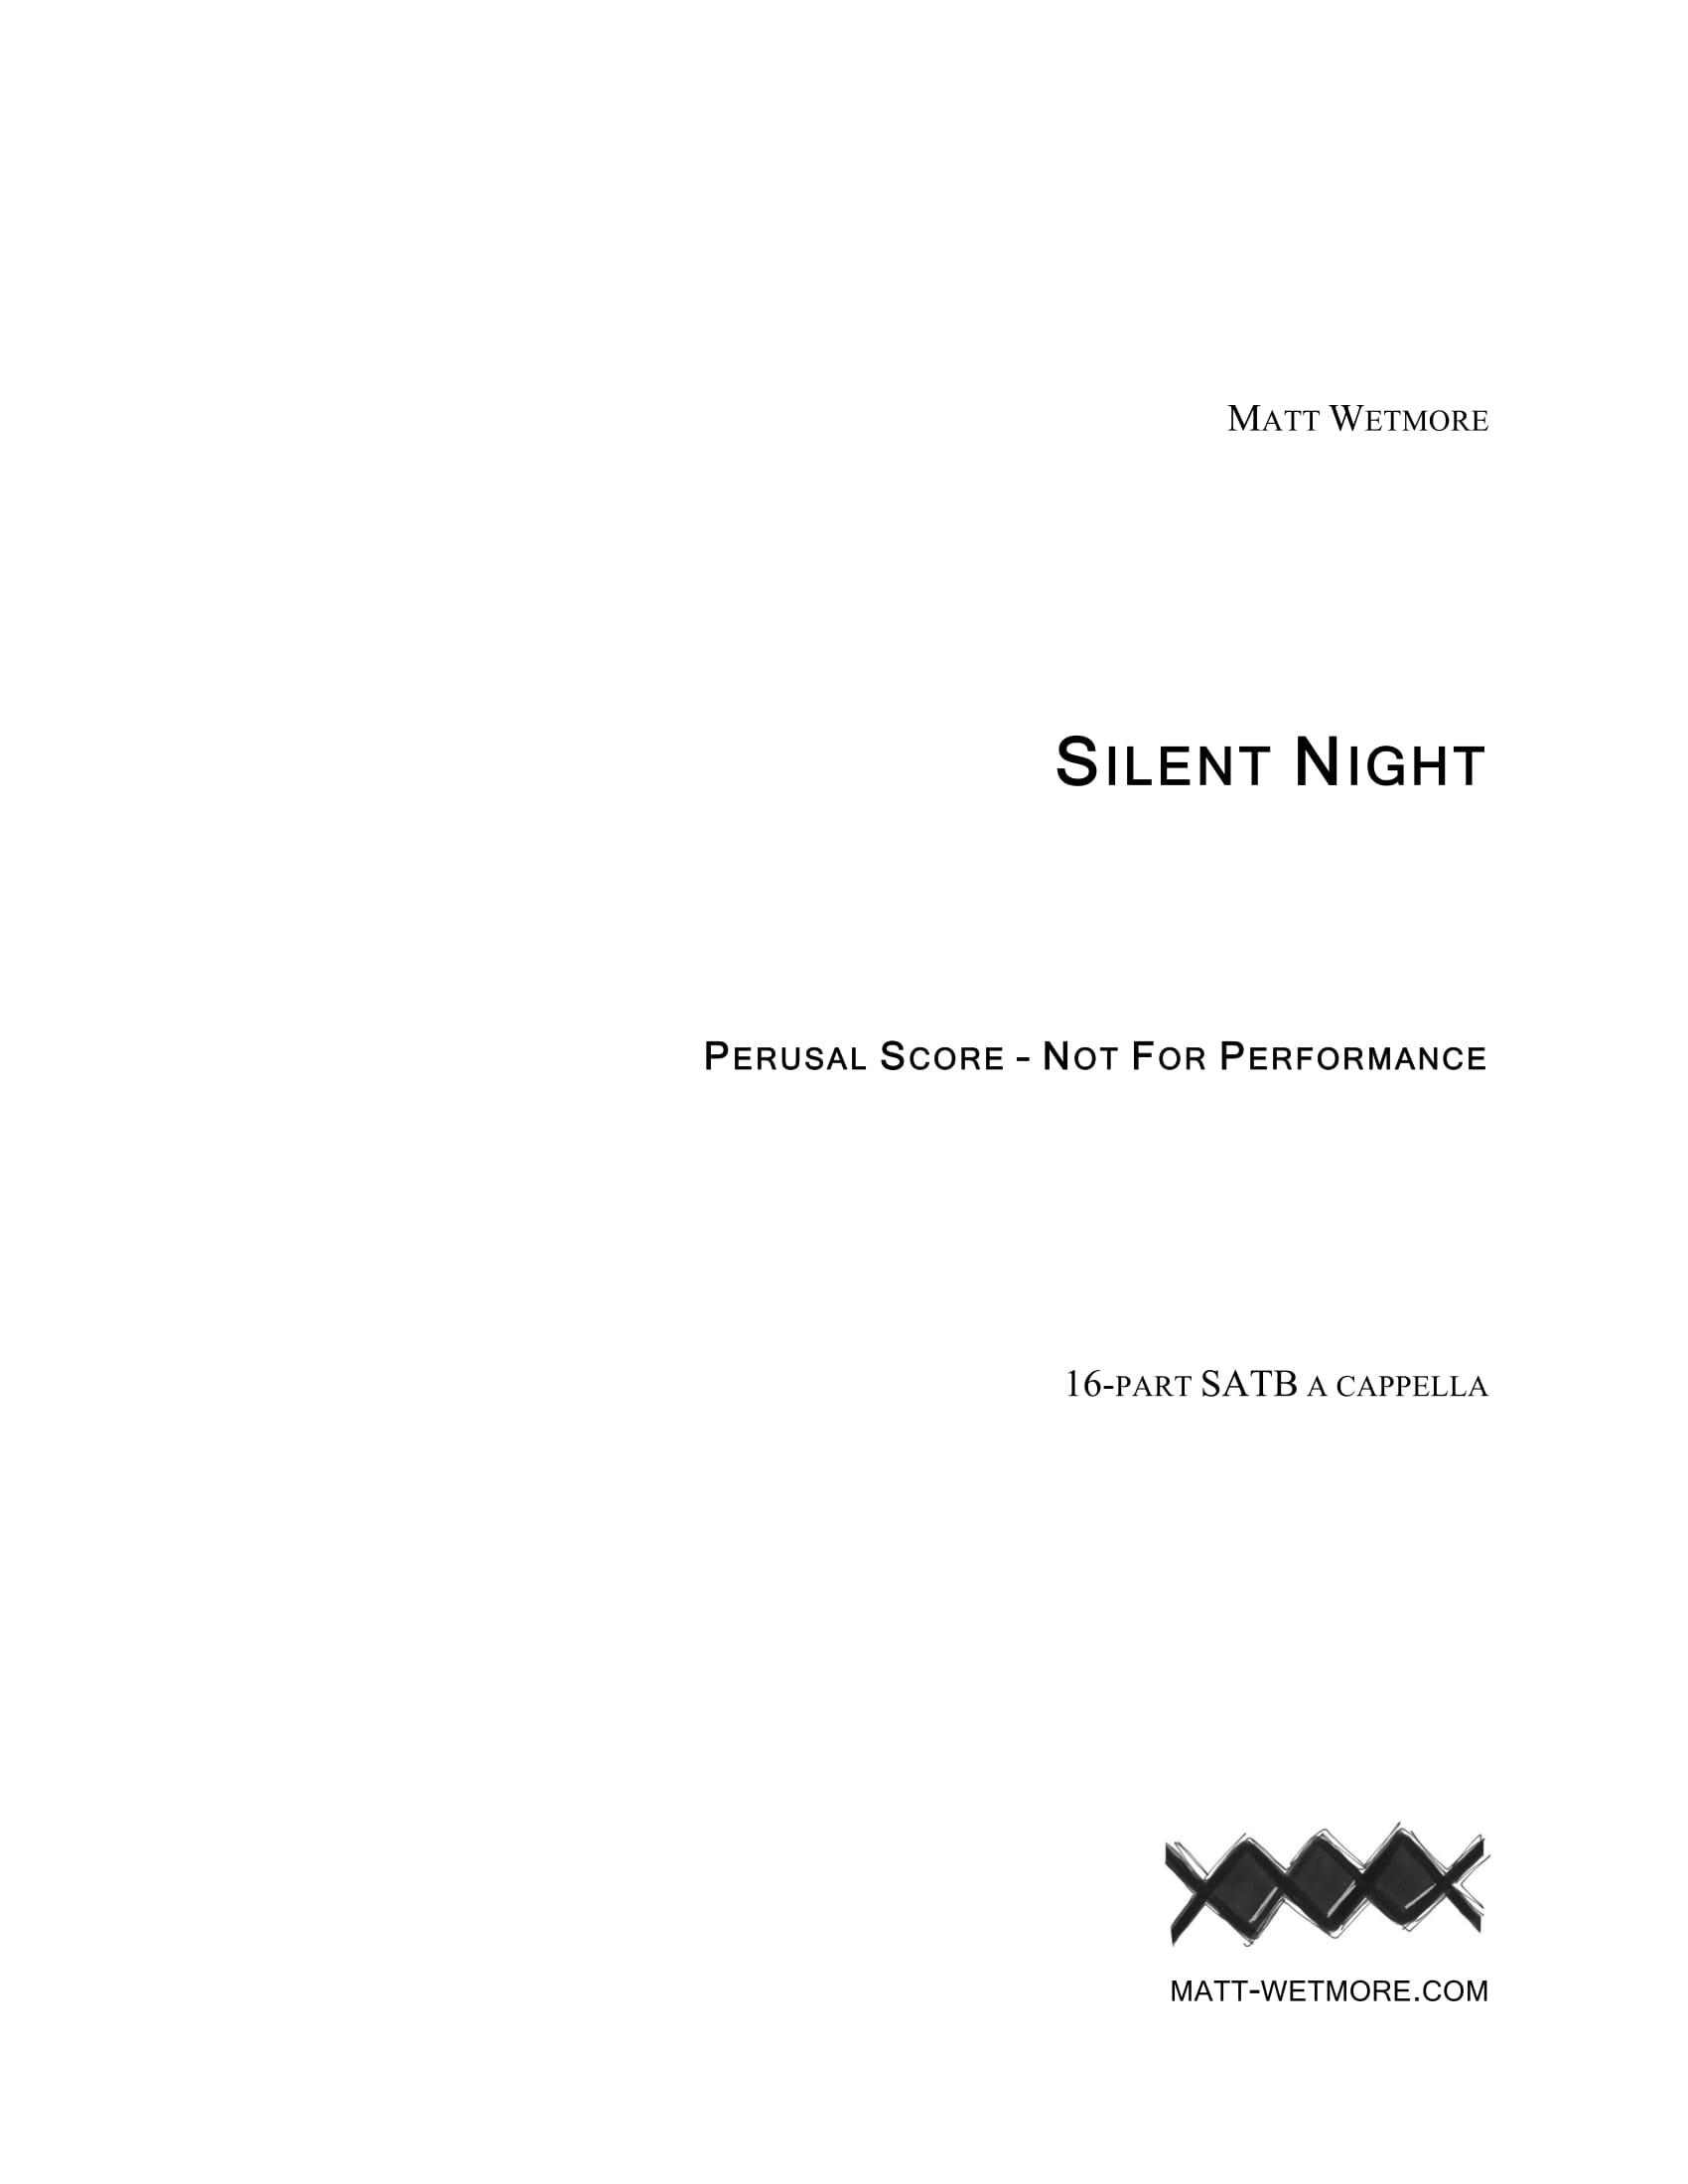 Silent Night - Perusal-01.jpg